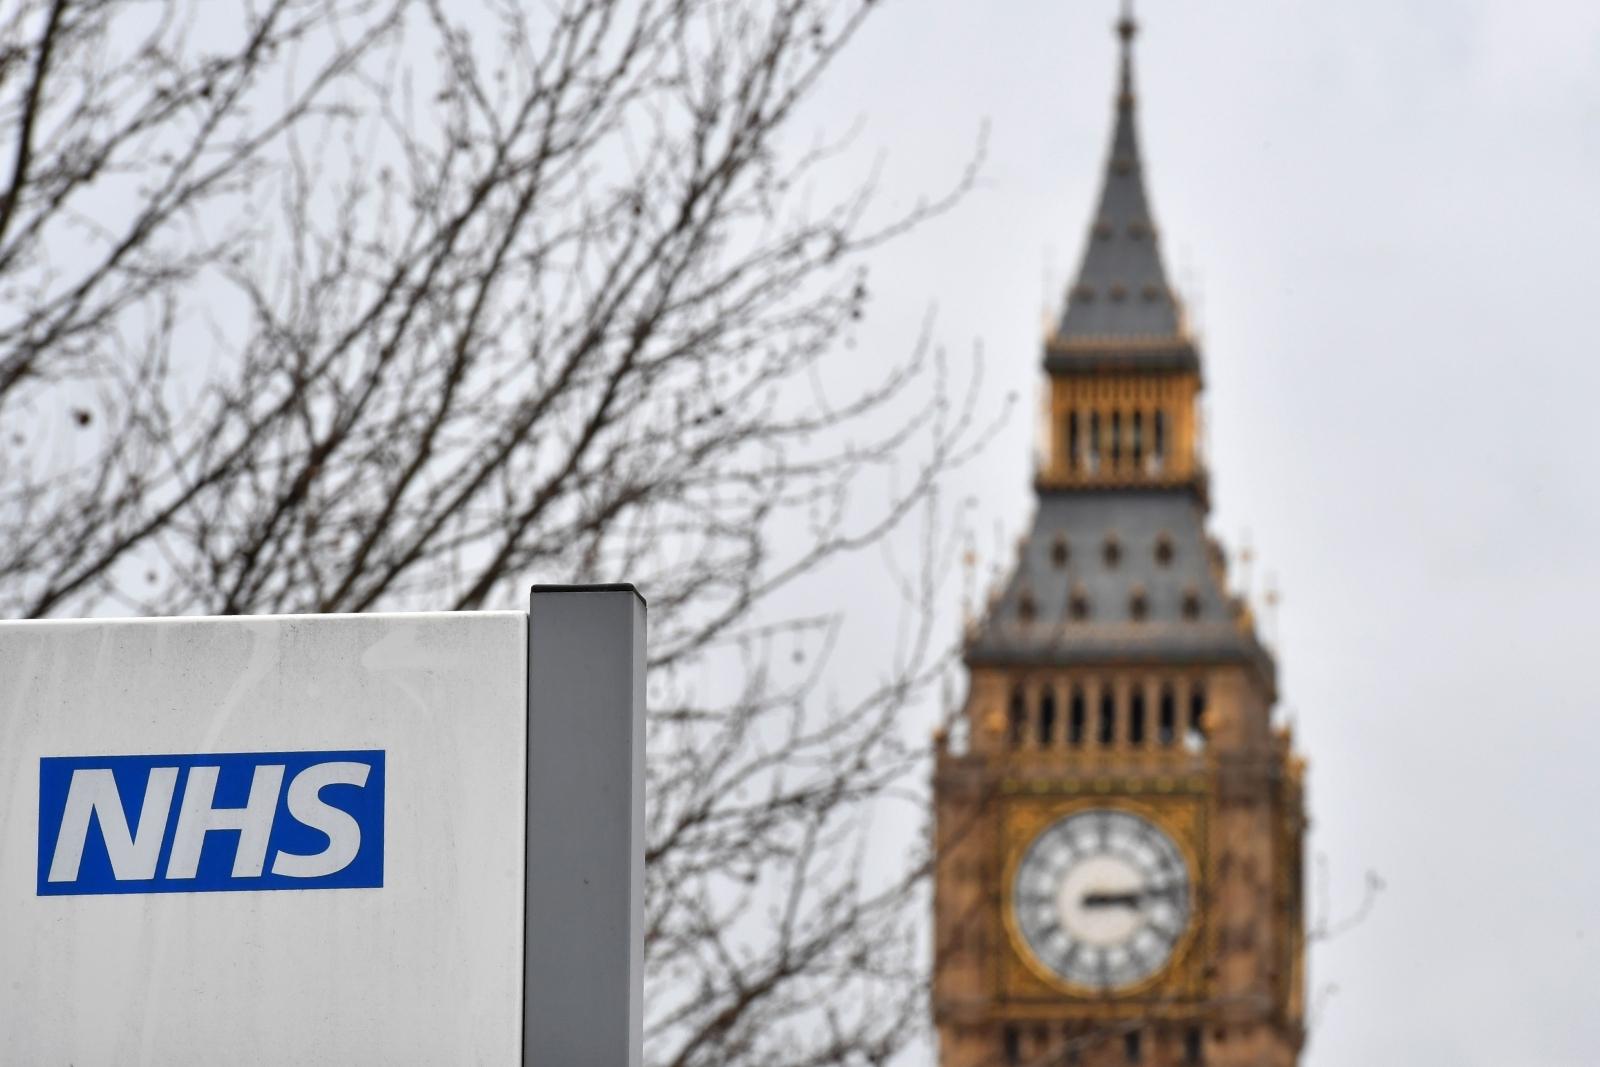 Digital transformation: Managing data to transform the NHS